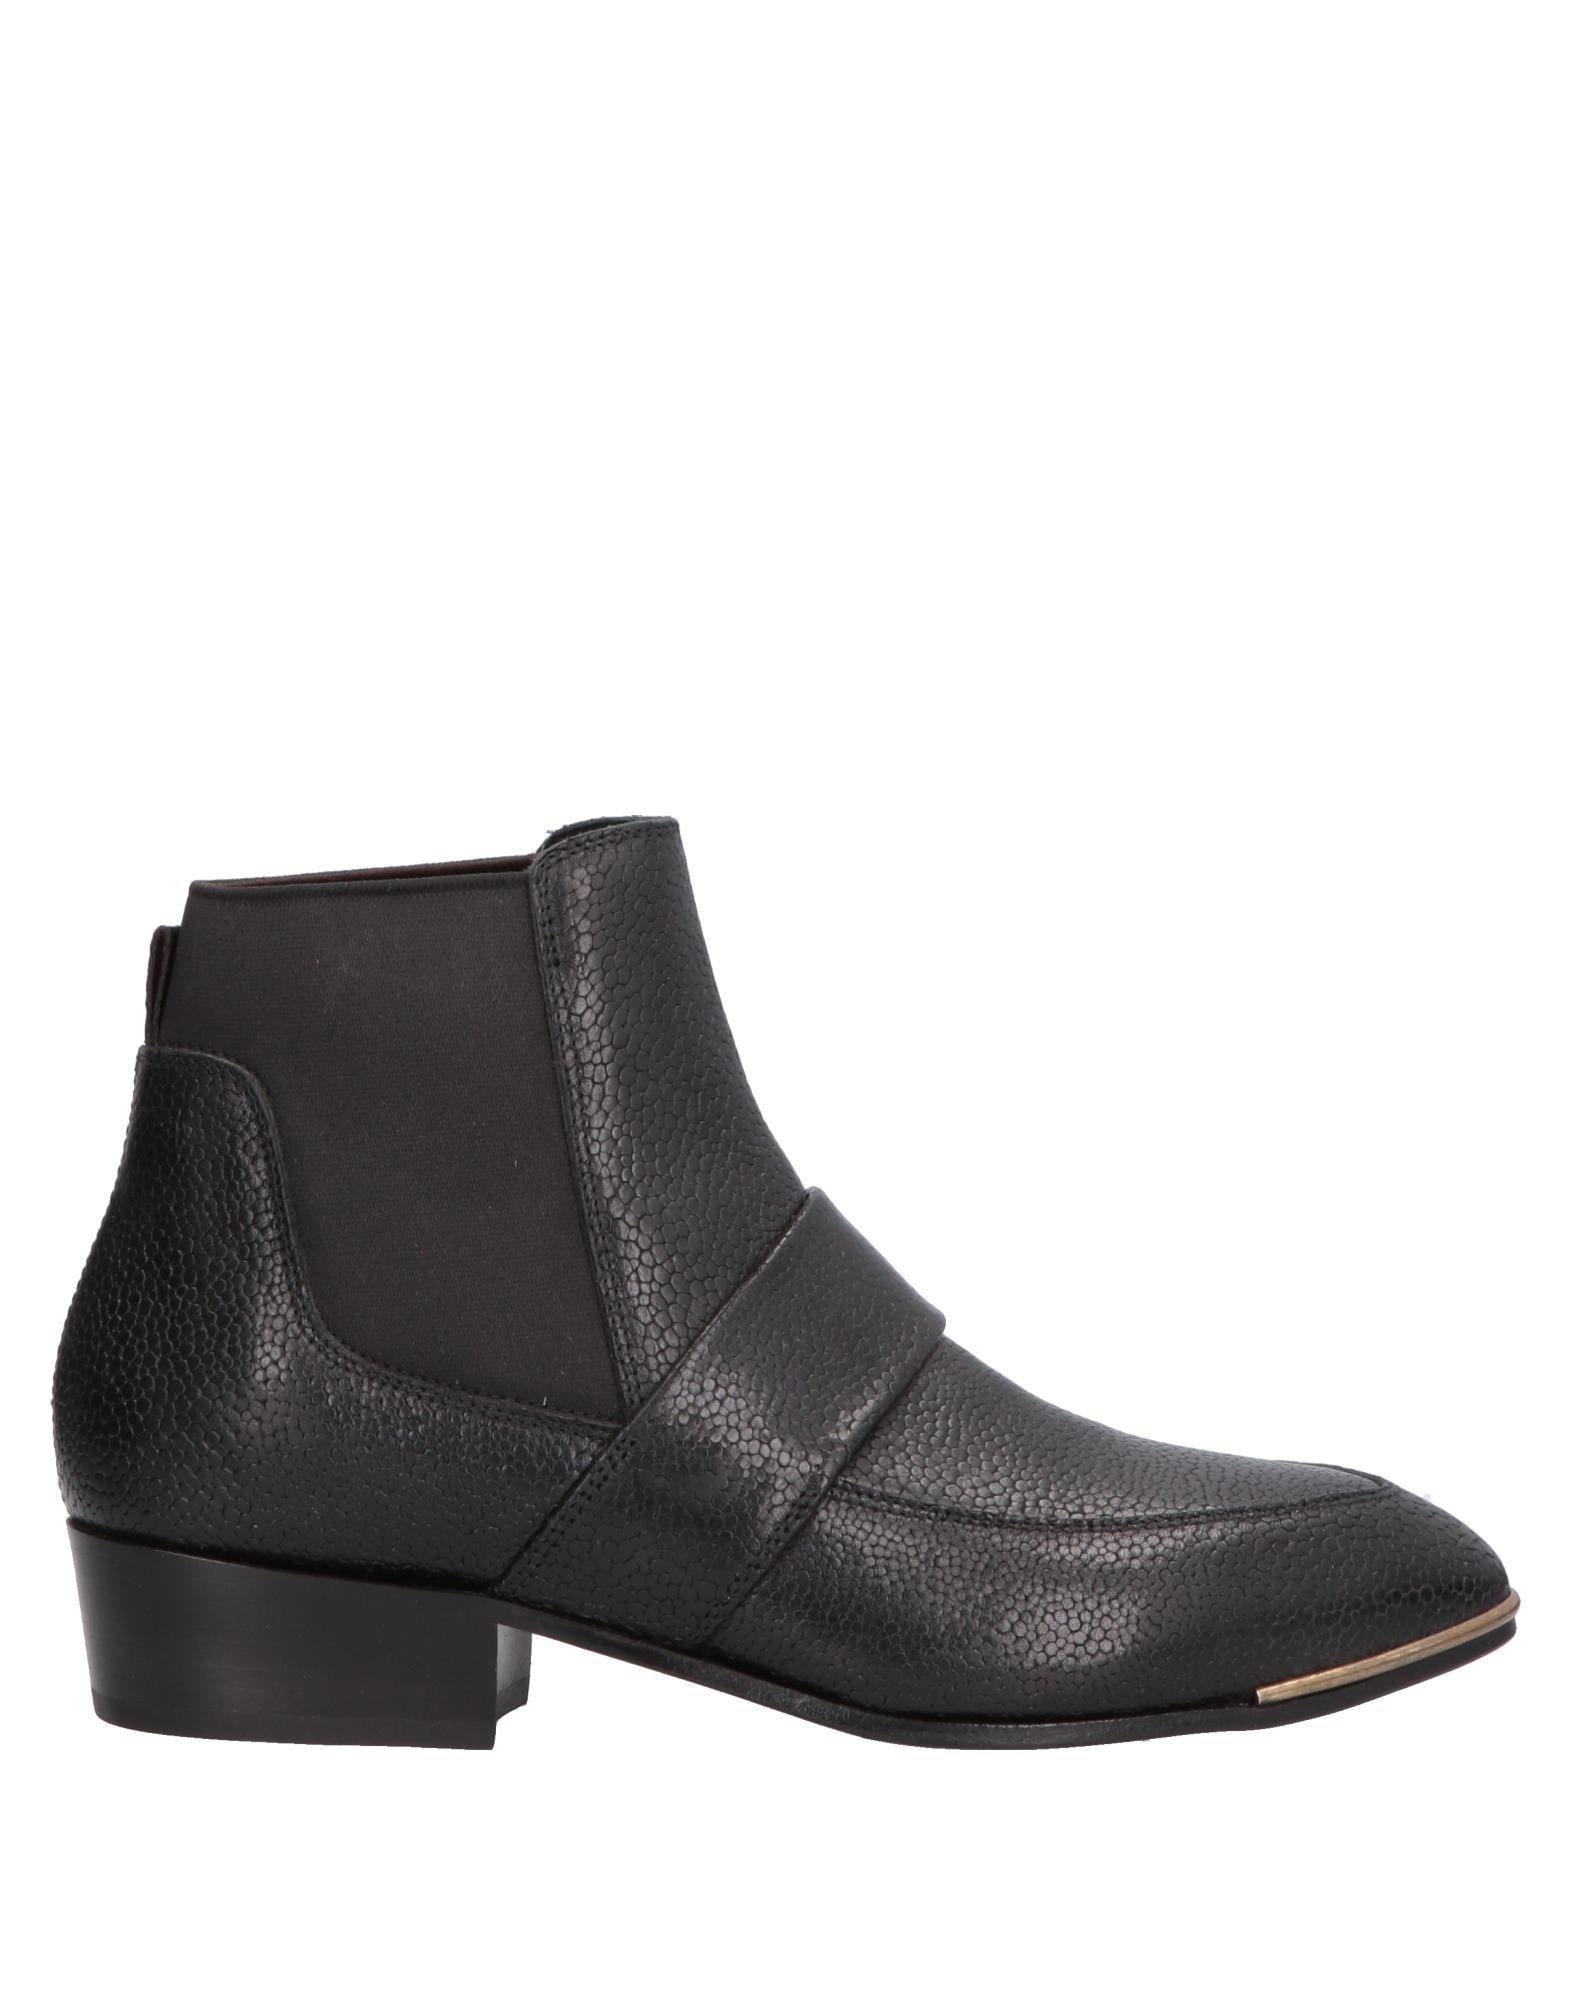 Buttero® Chelsea Boots Damen  11553463ONGut aussehende strapazierfähige Schuhe